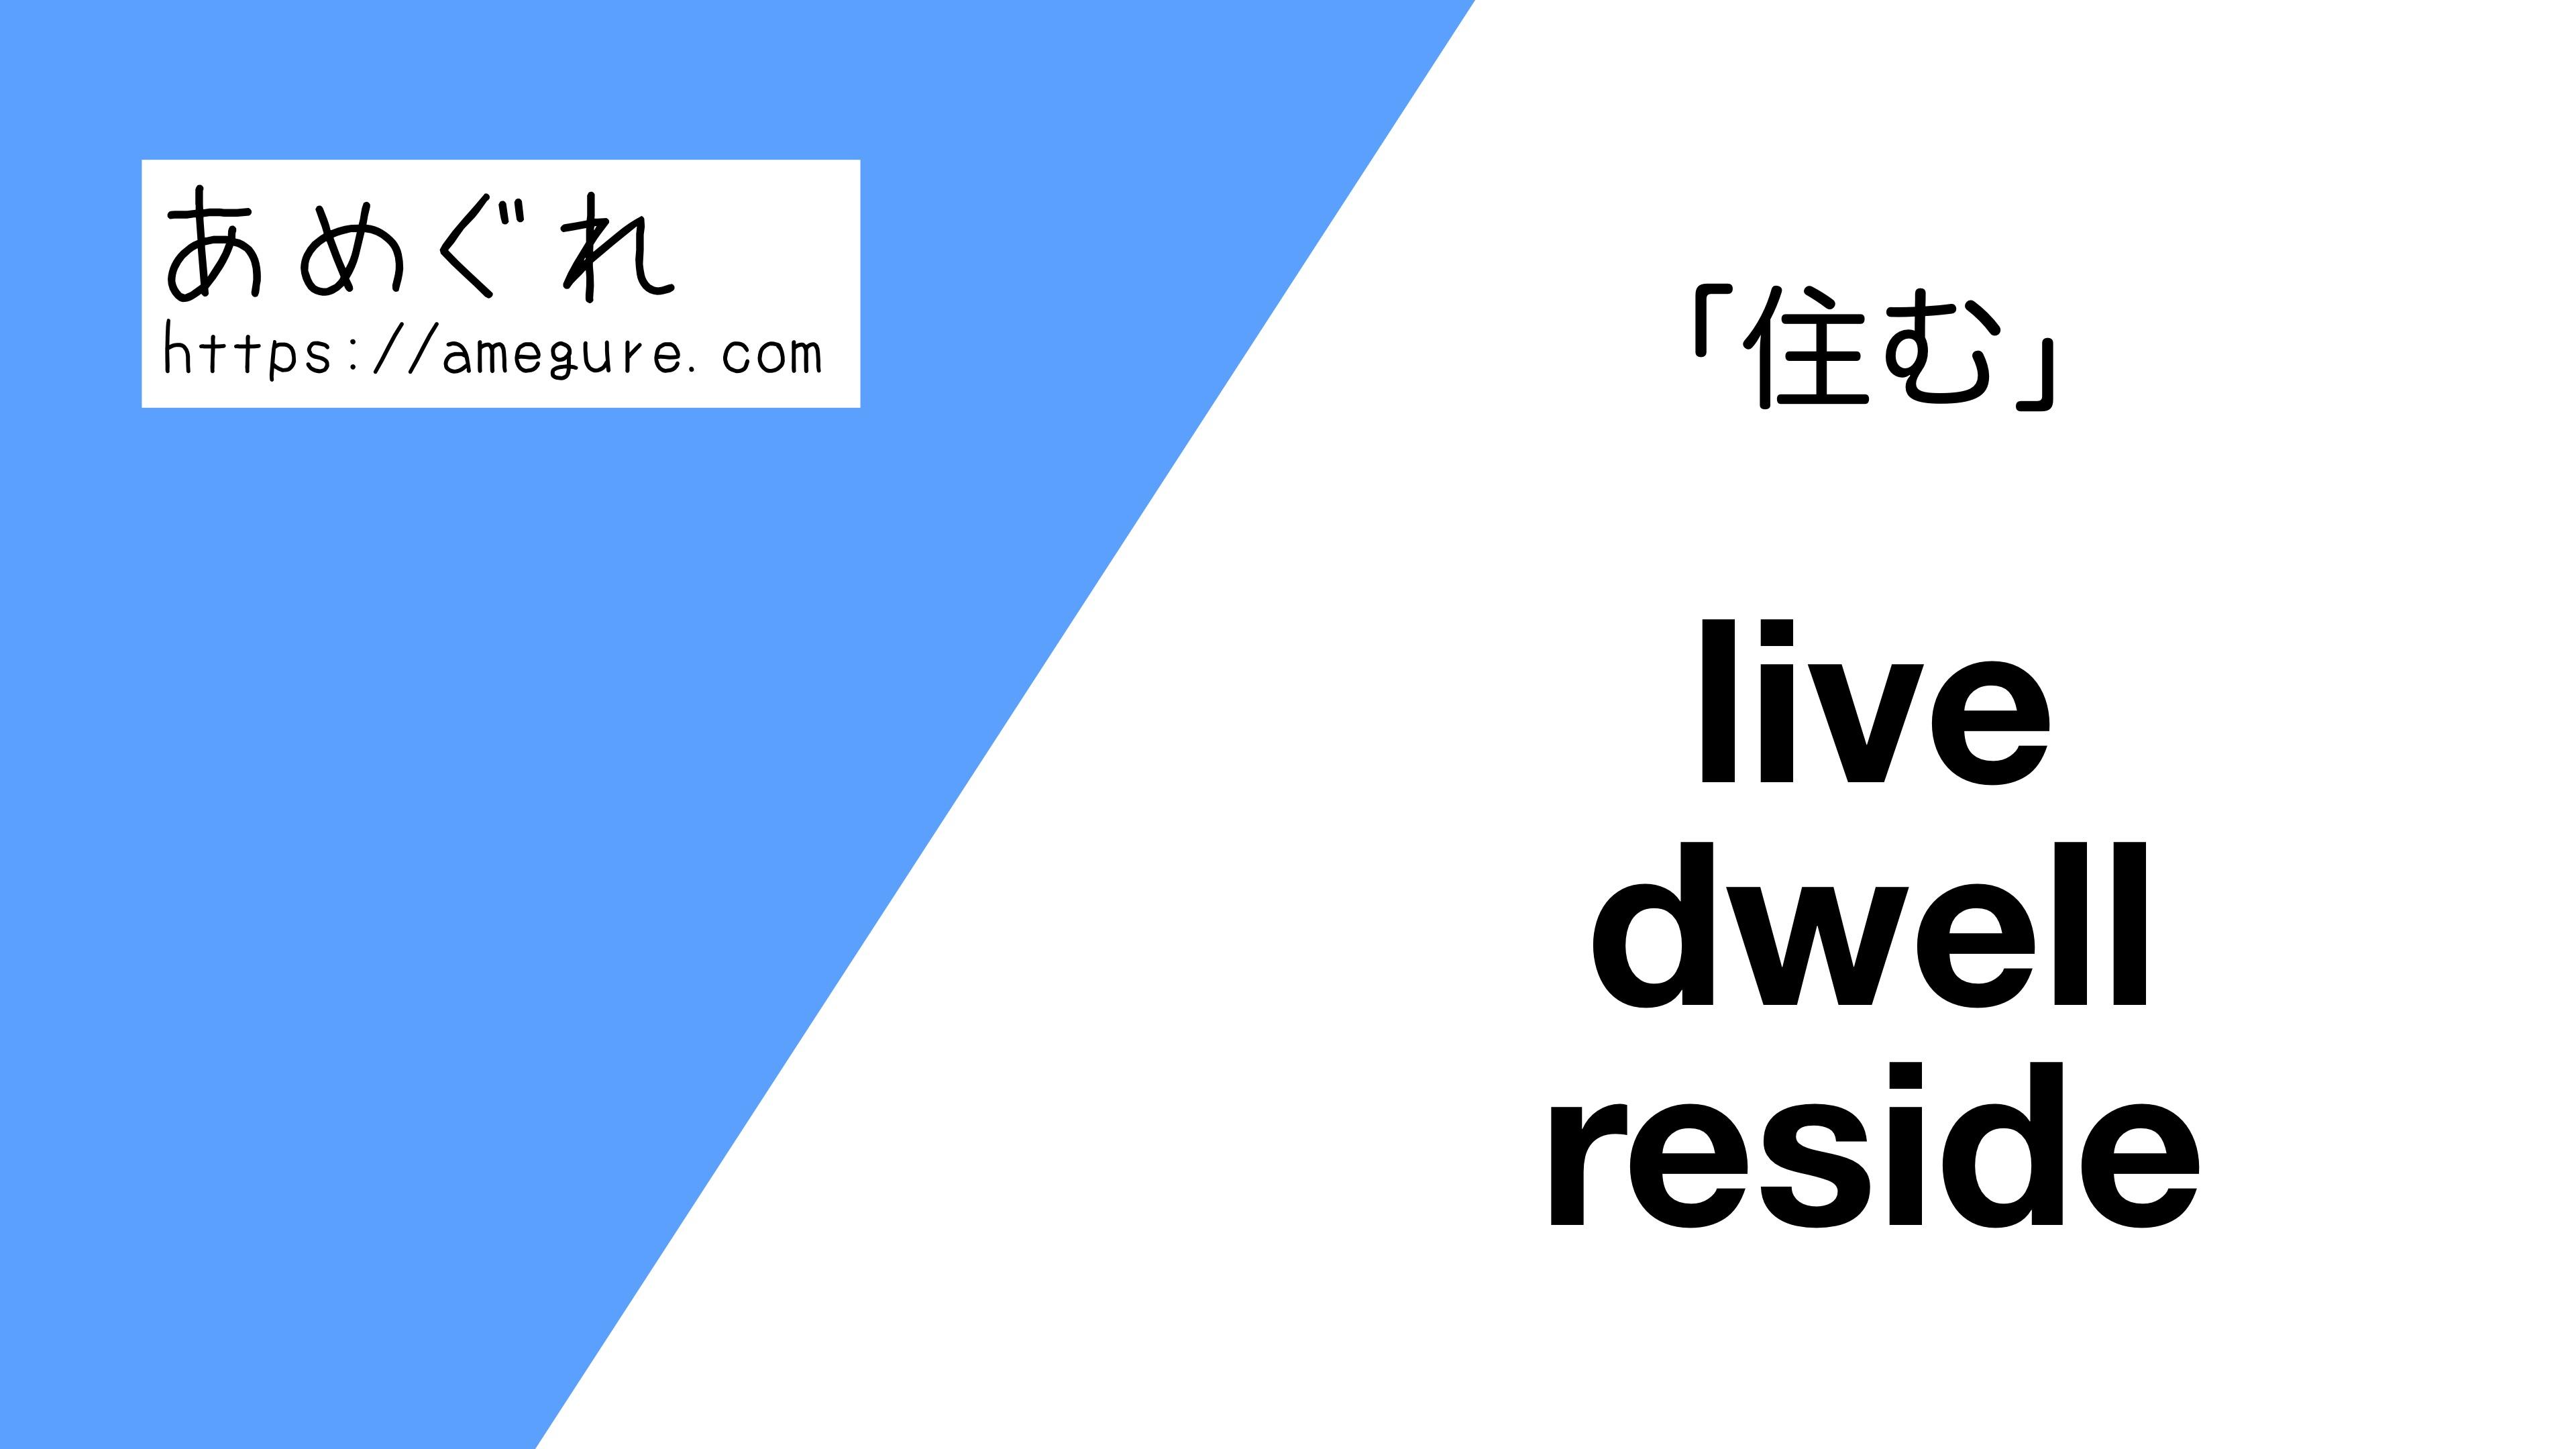 live-dwell-reside違い